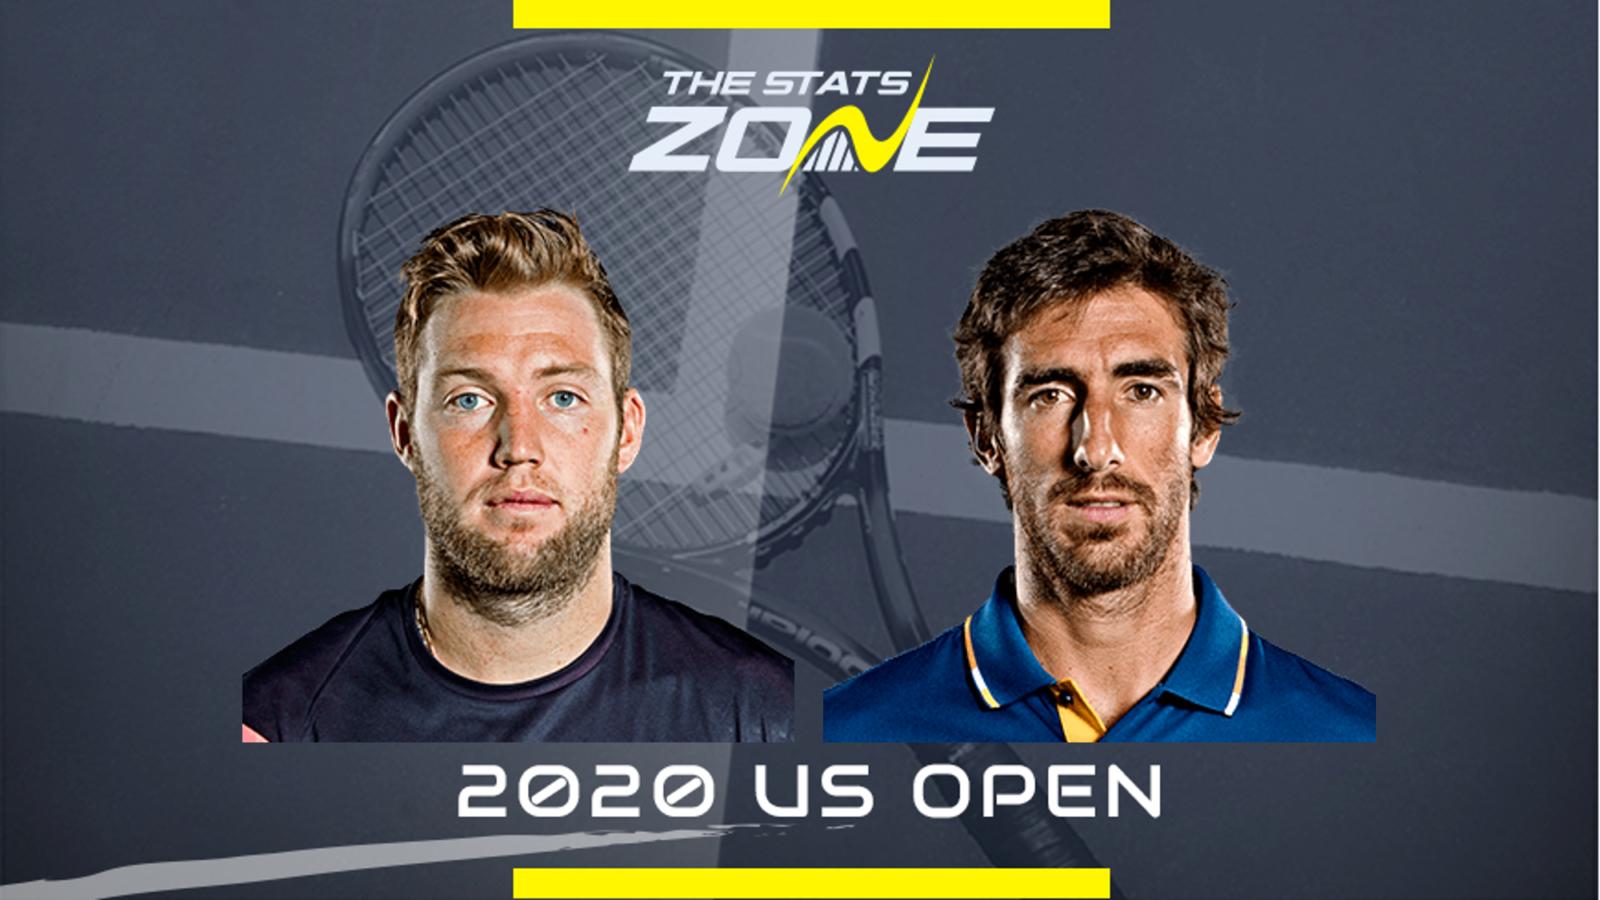 2020 Us Open Jack Sock Vs Pablo Cuevas Preview Prediction The Stats Zone